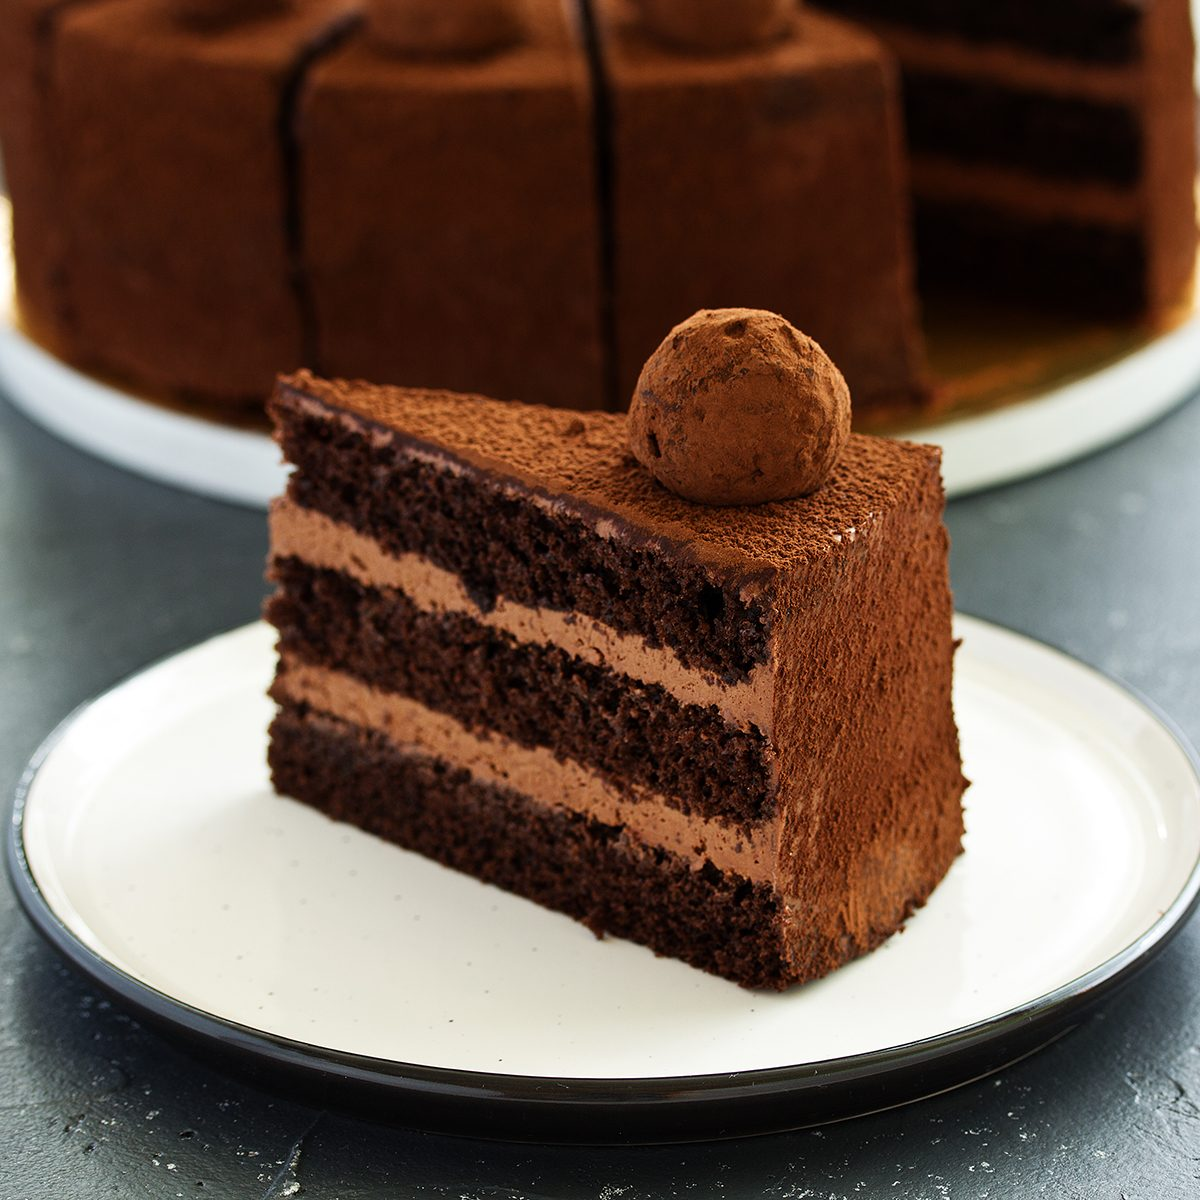 Chocolate cake. A slice of chocolate cake. Selective focus; Shutterstock ID 1499400482; Job (TFH, TOH, RD, BNB, CWM, CM): TOH